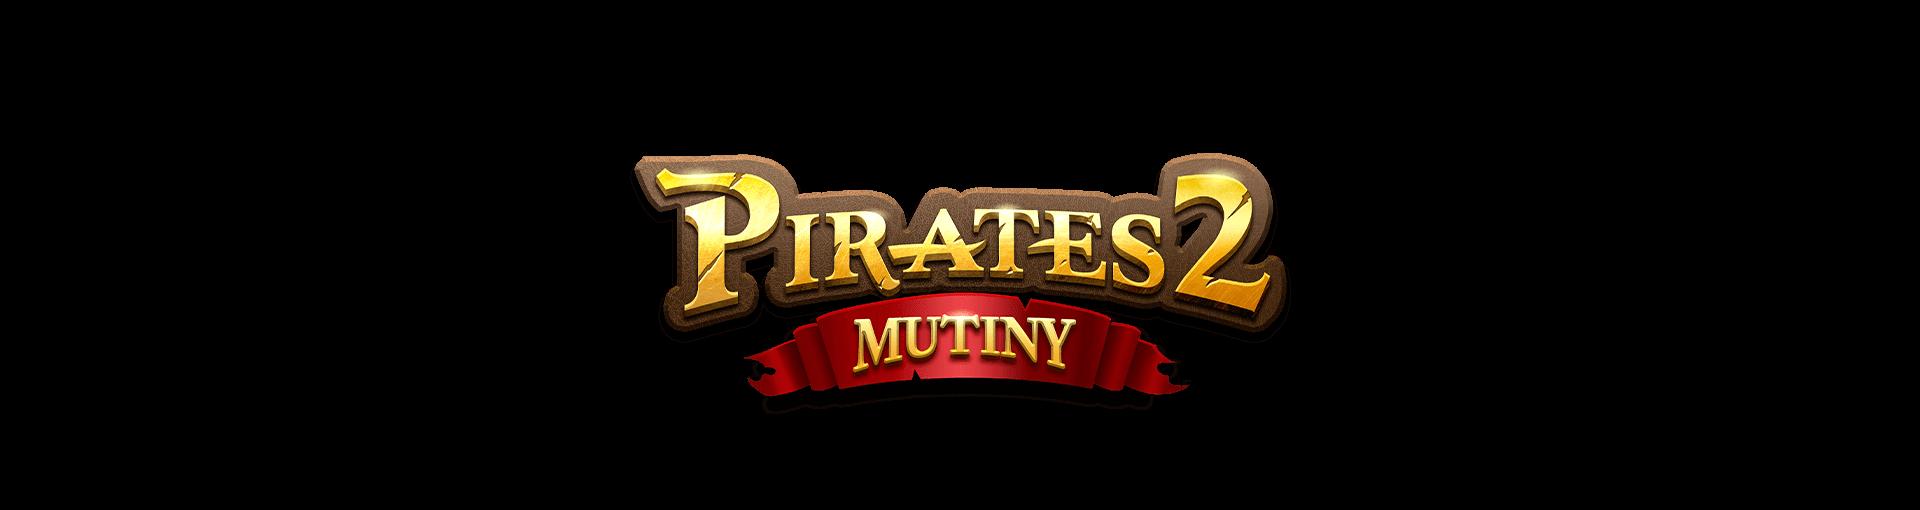 pirates-2-Yggdrasil-UpcomingGame-Logo-Template-1920x510px